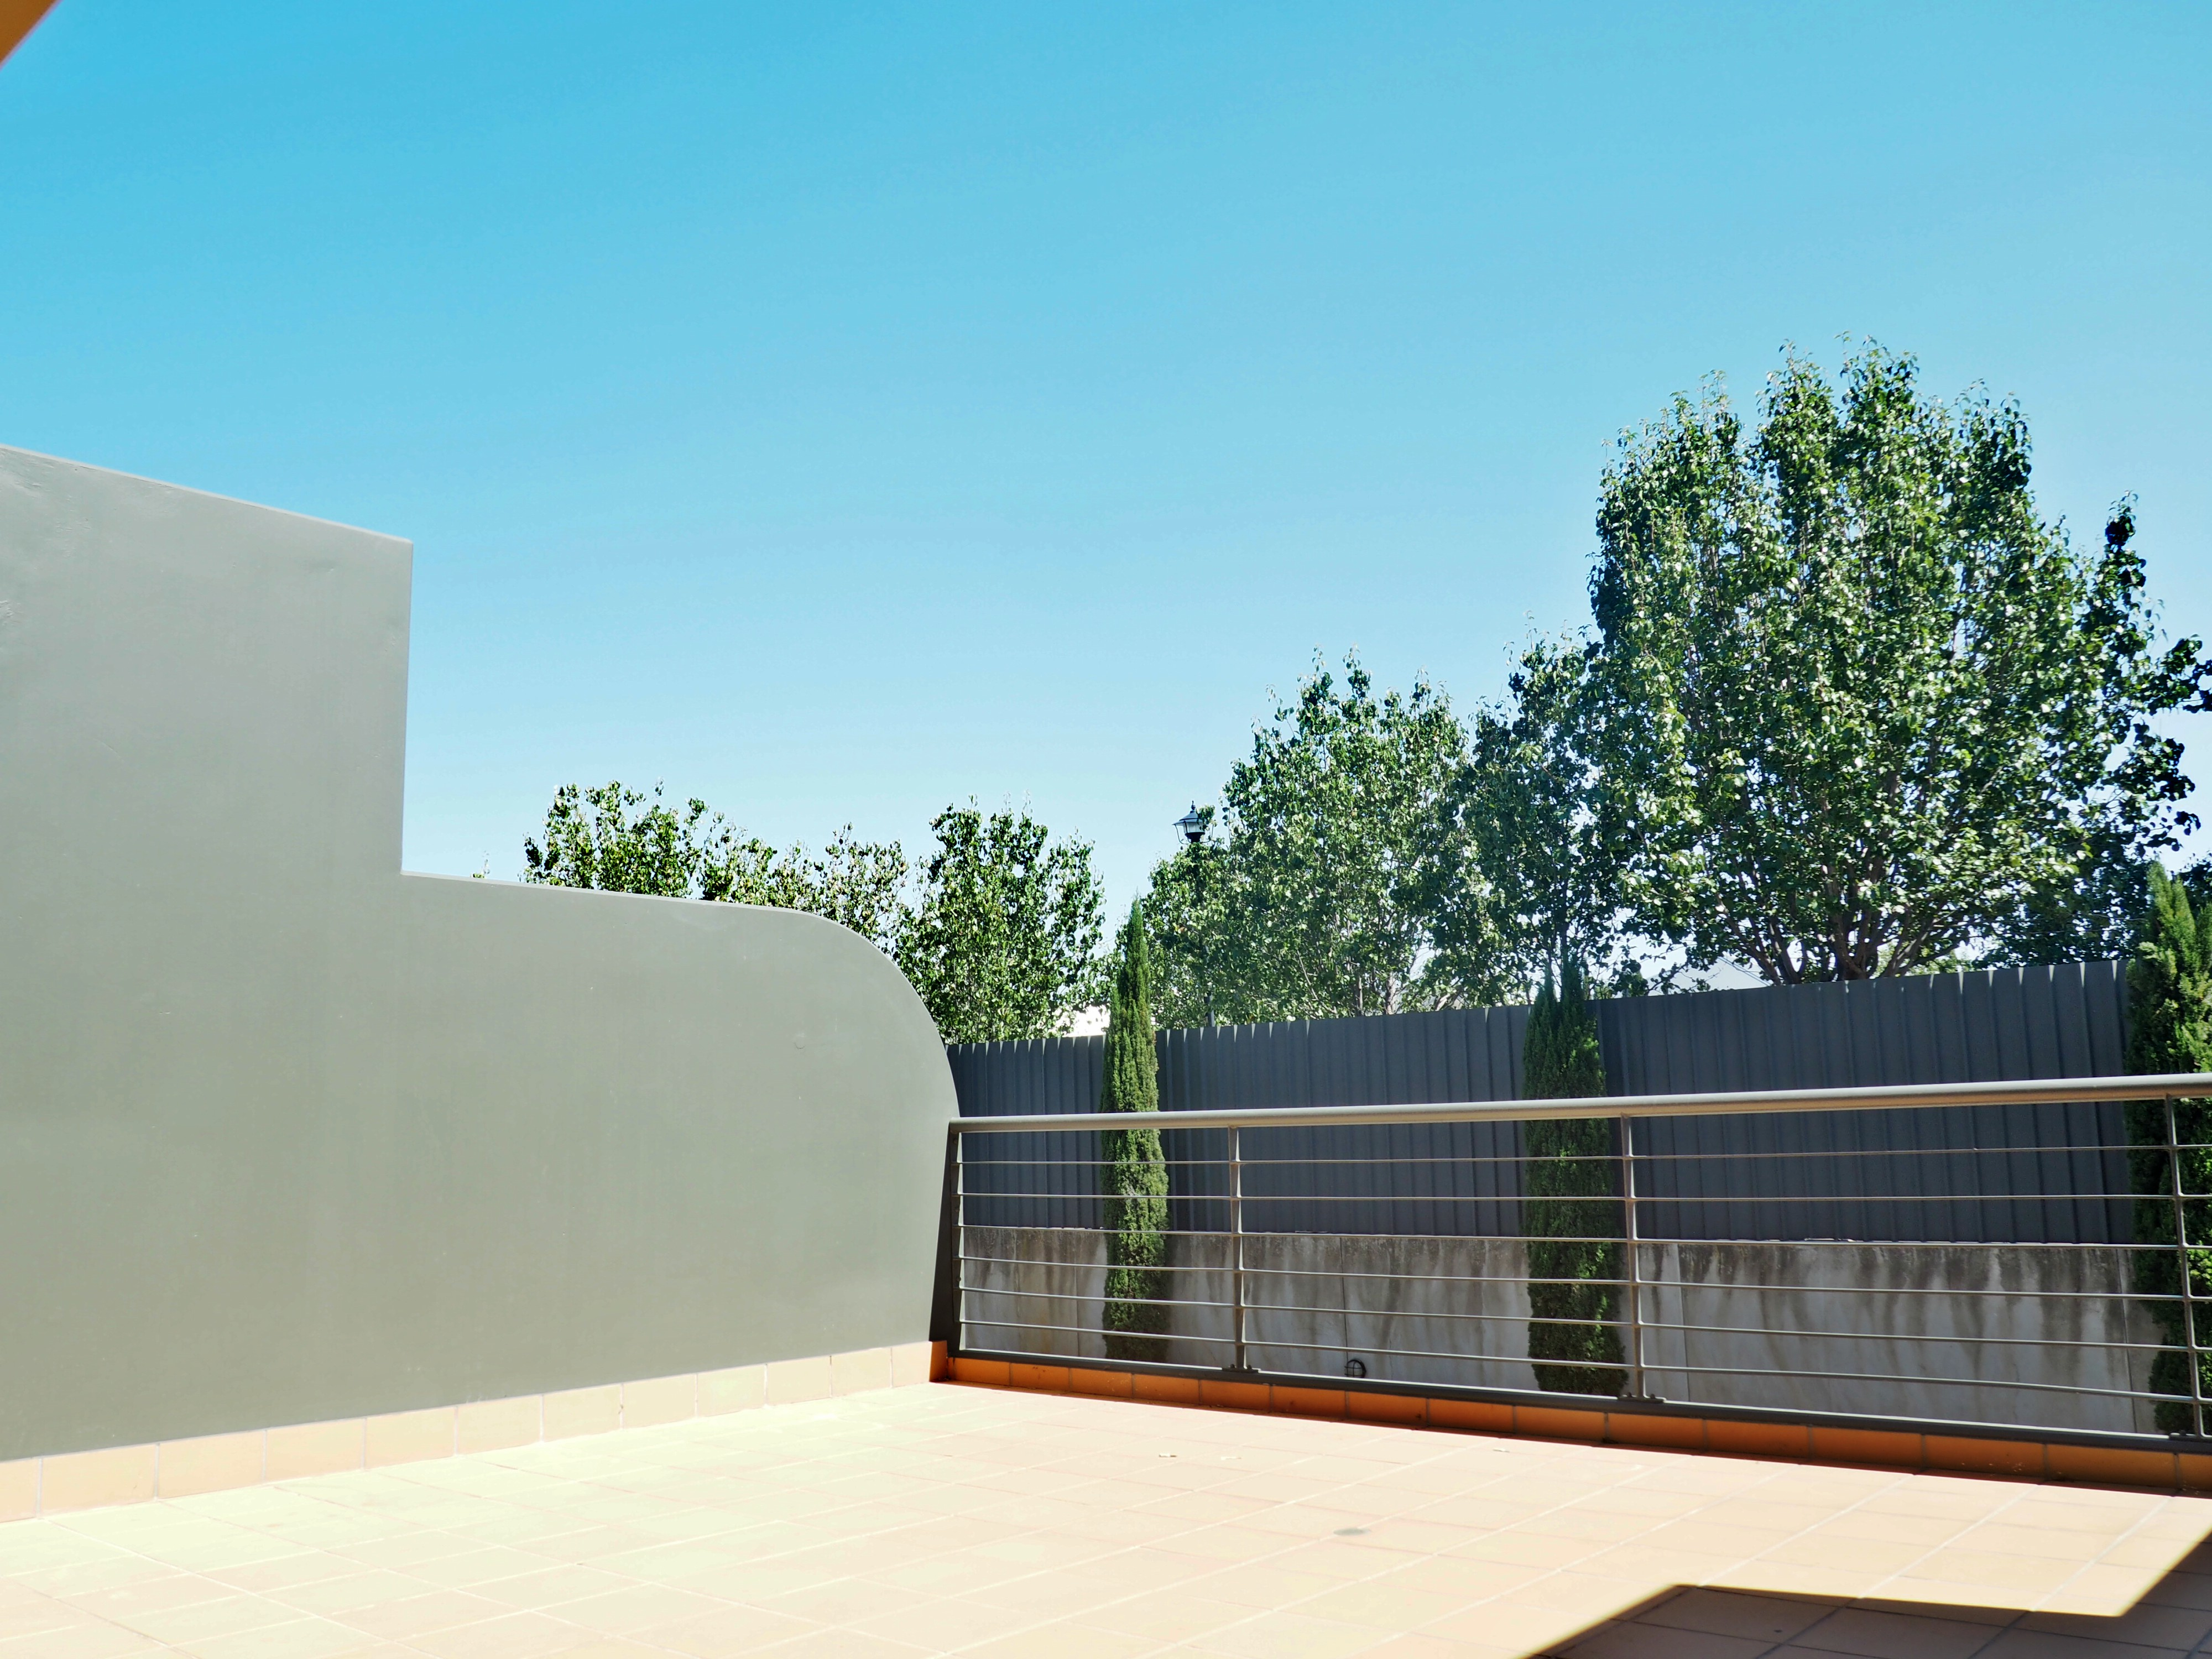 mydimport-1596538590-hires.17533-balcony1.JPG